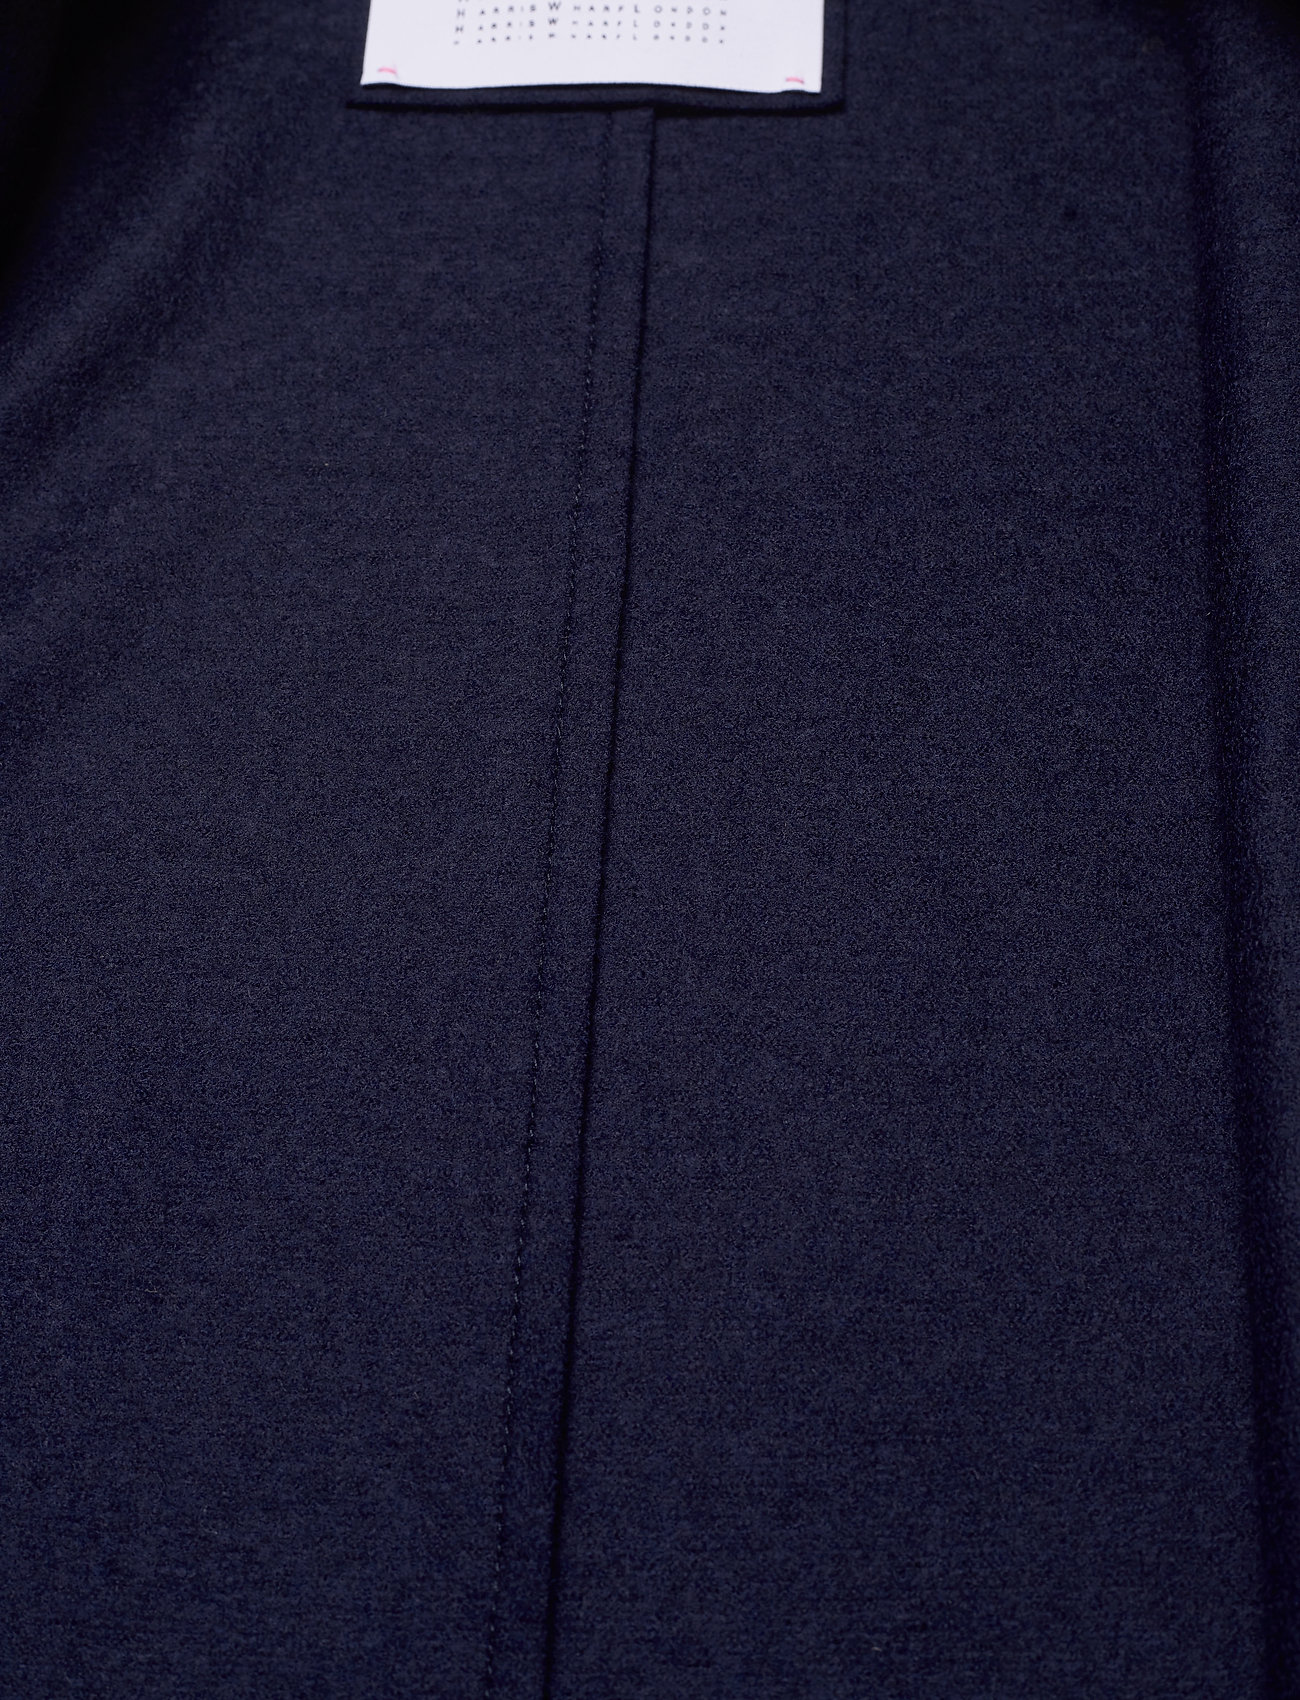 Harris Wharf London - Women Overcoat Light Pressed Wool - wollmäntel - navy blue - 4